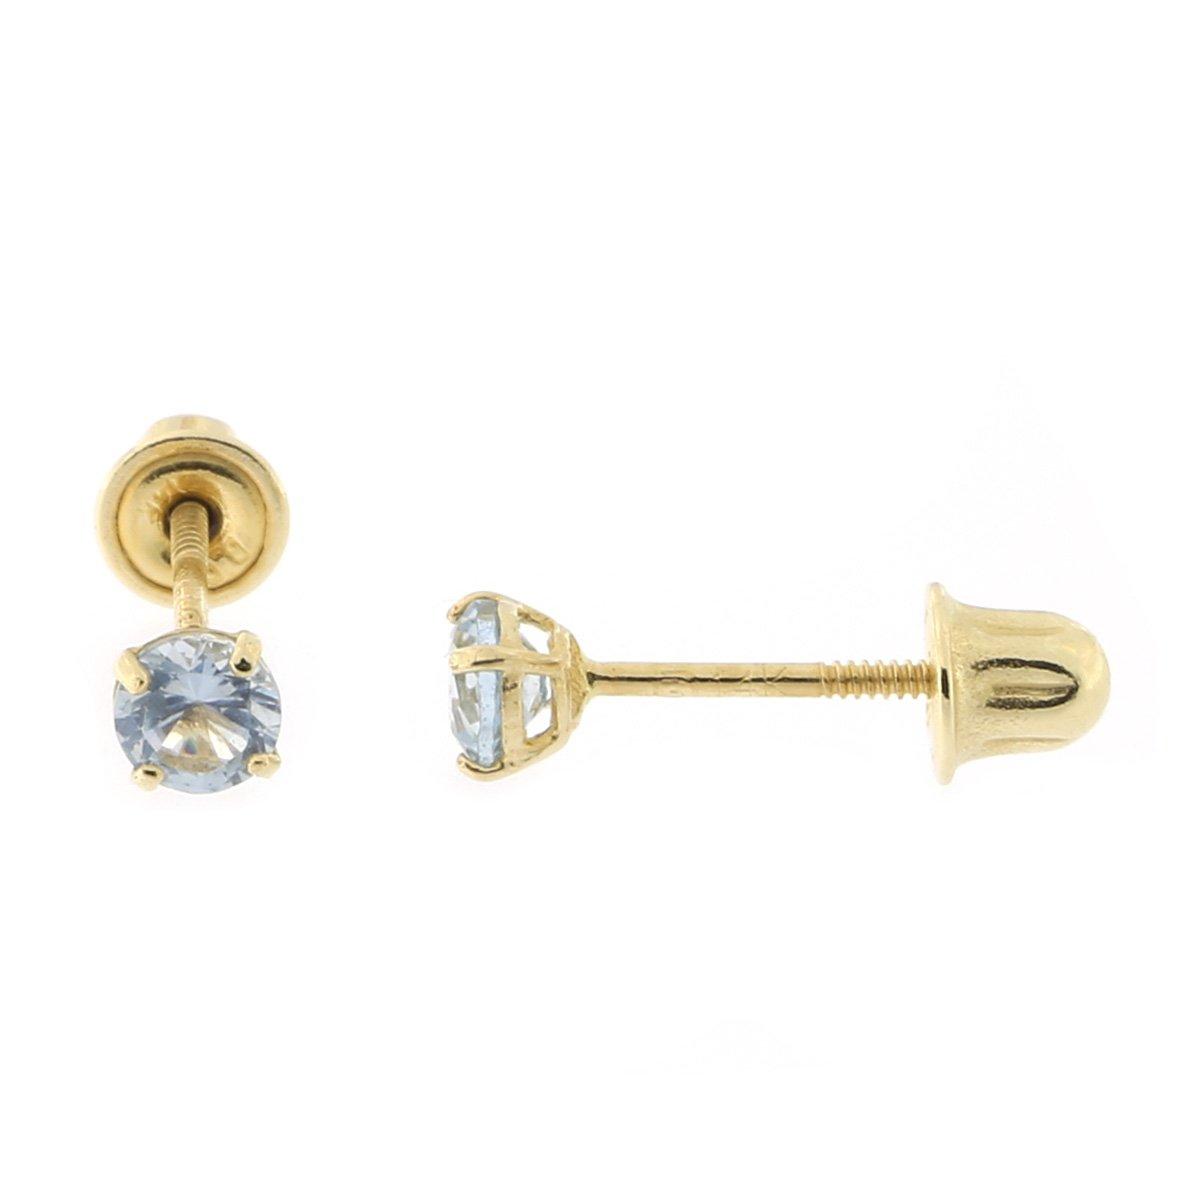 Solid 14k White Gold Cross Screw Back Stud Earrings 8 x 6mm SPARKLING CZS Unisex